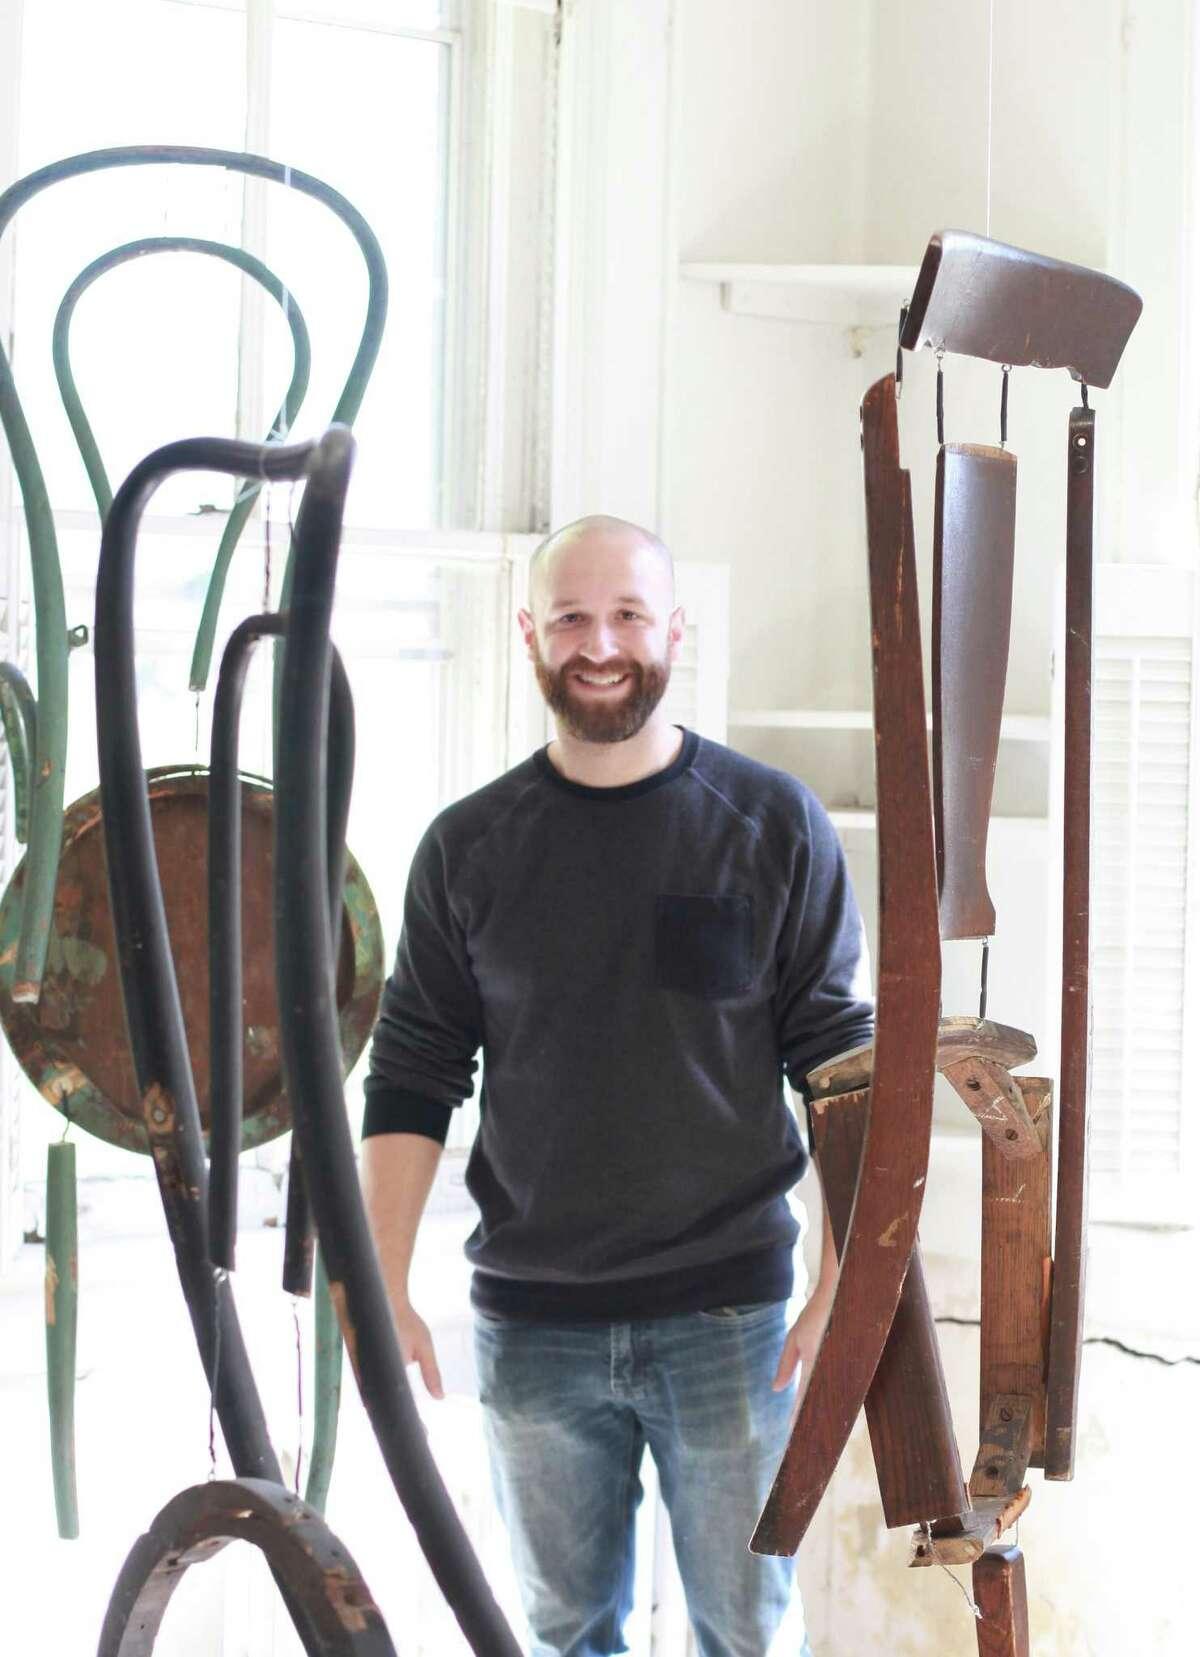 Ben Quesnel will co-moderate the Bruce Museum's street art talk.